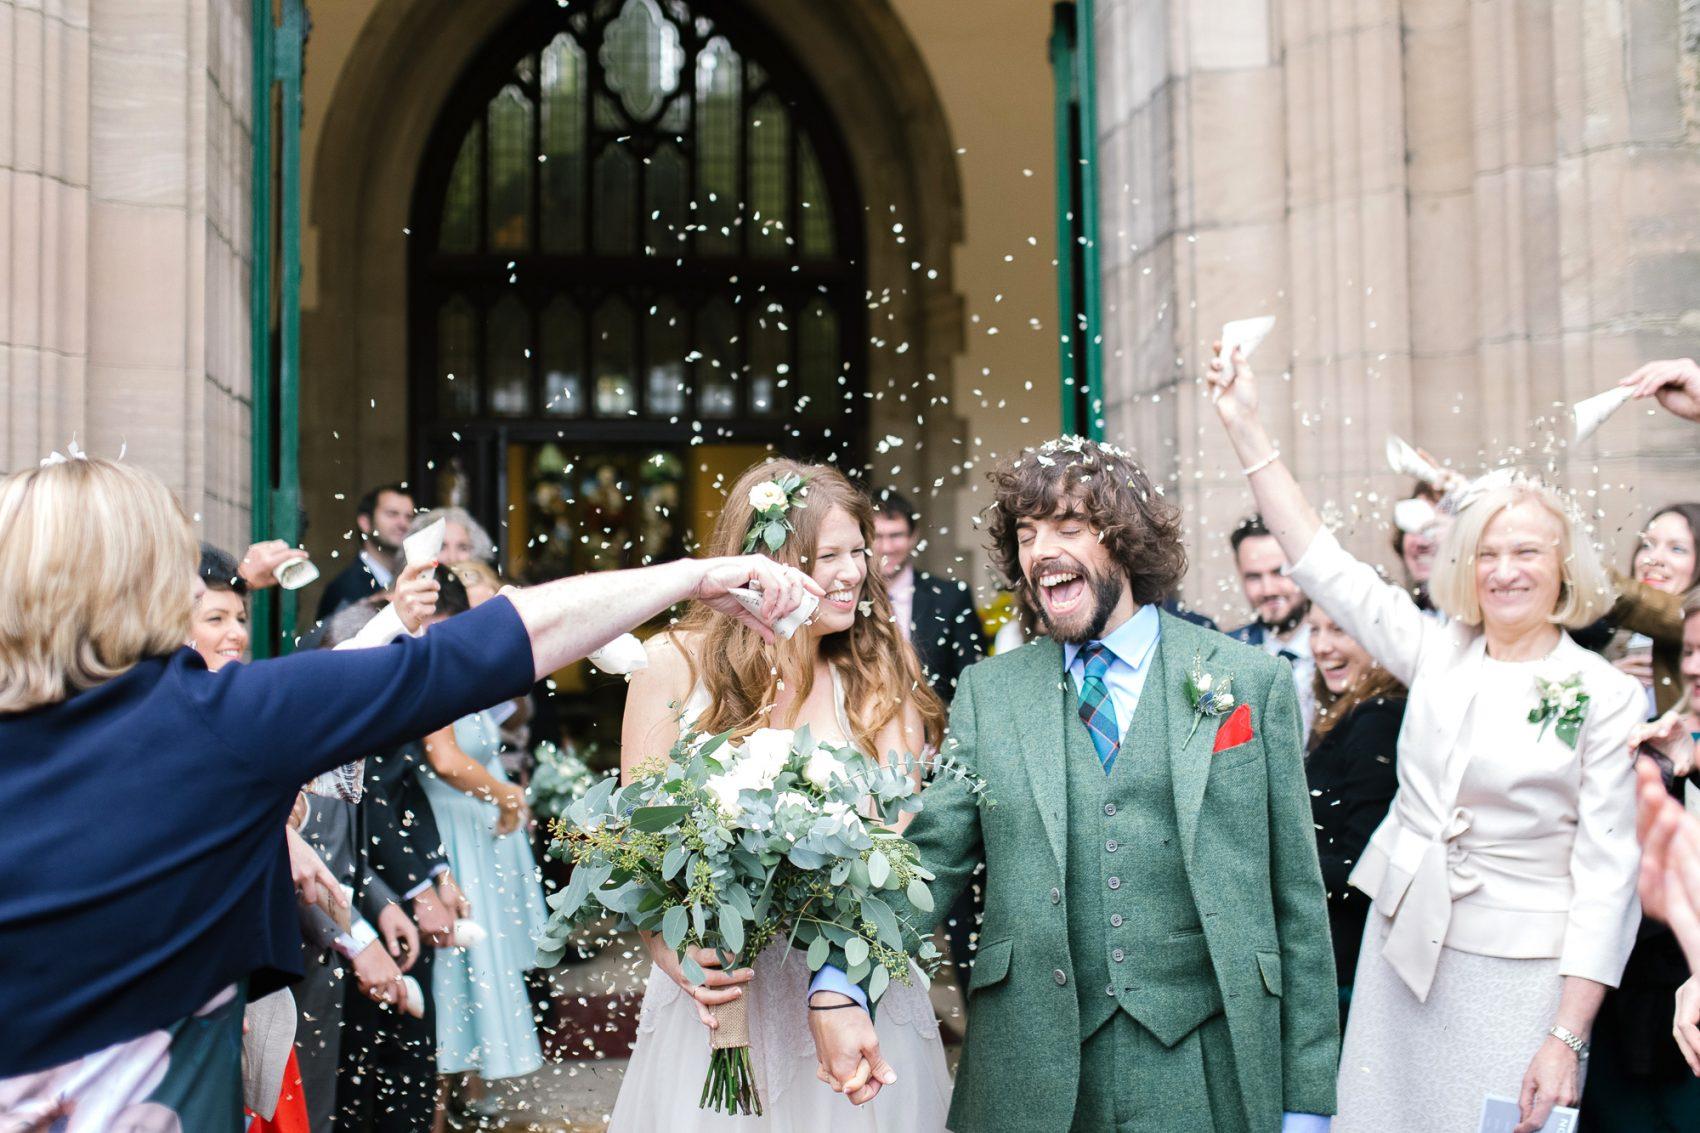 img_7055-19-1700x1133 Matt & Michelle // Belfast City Centre Wedding